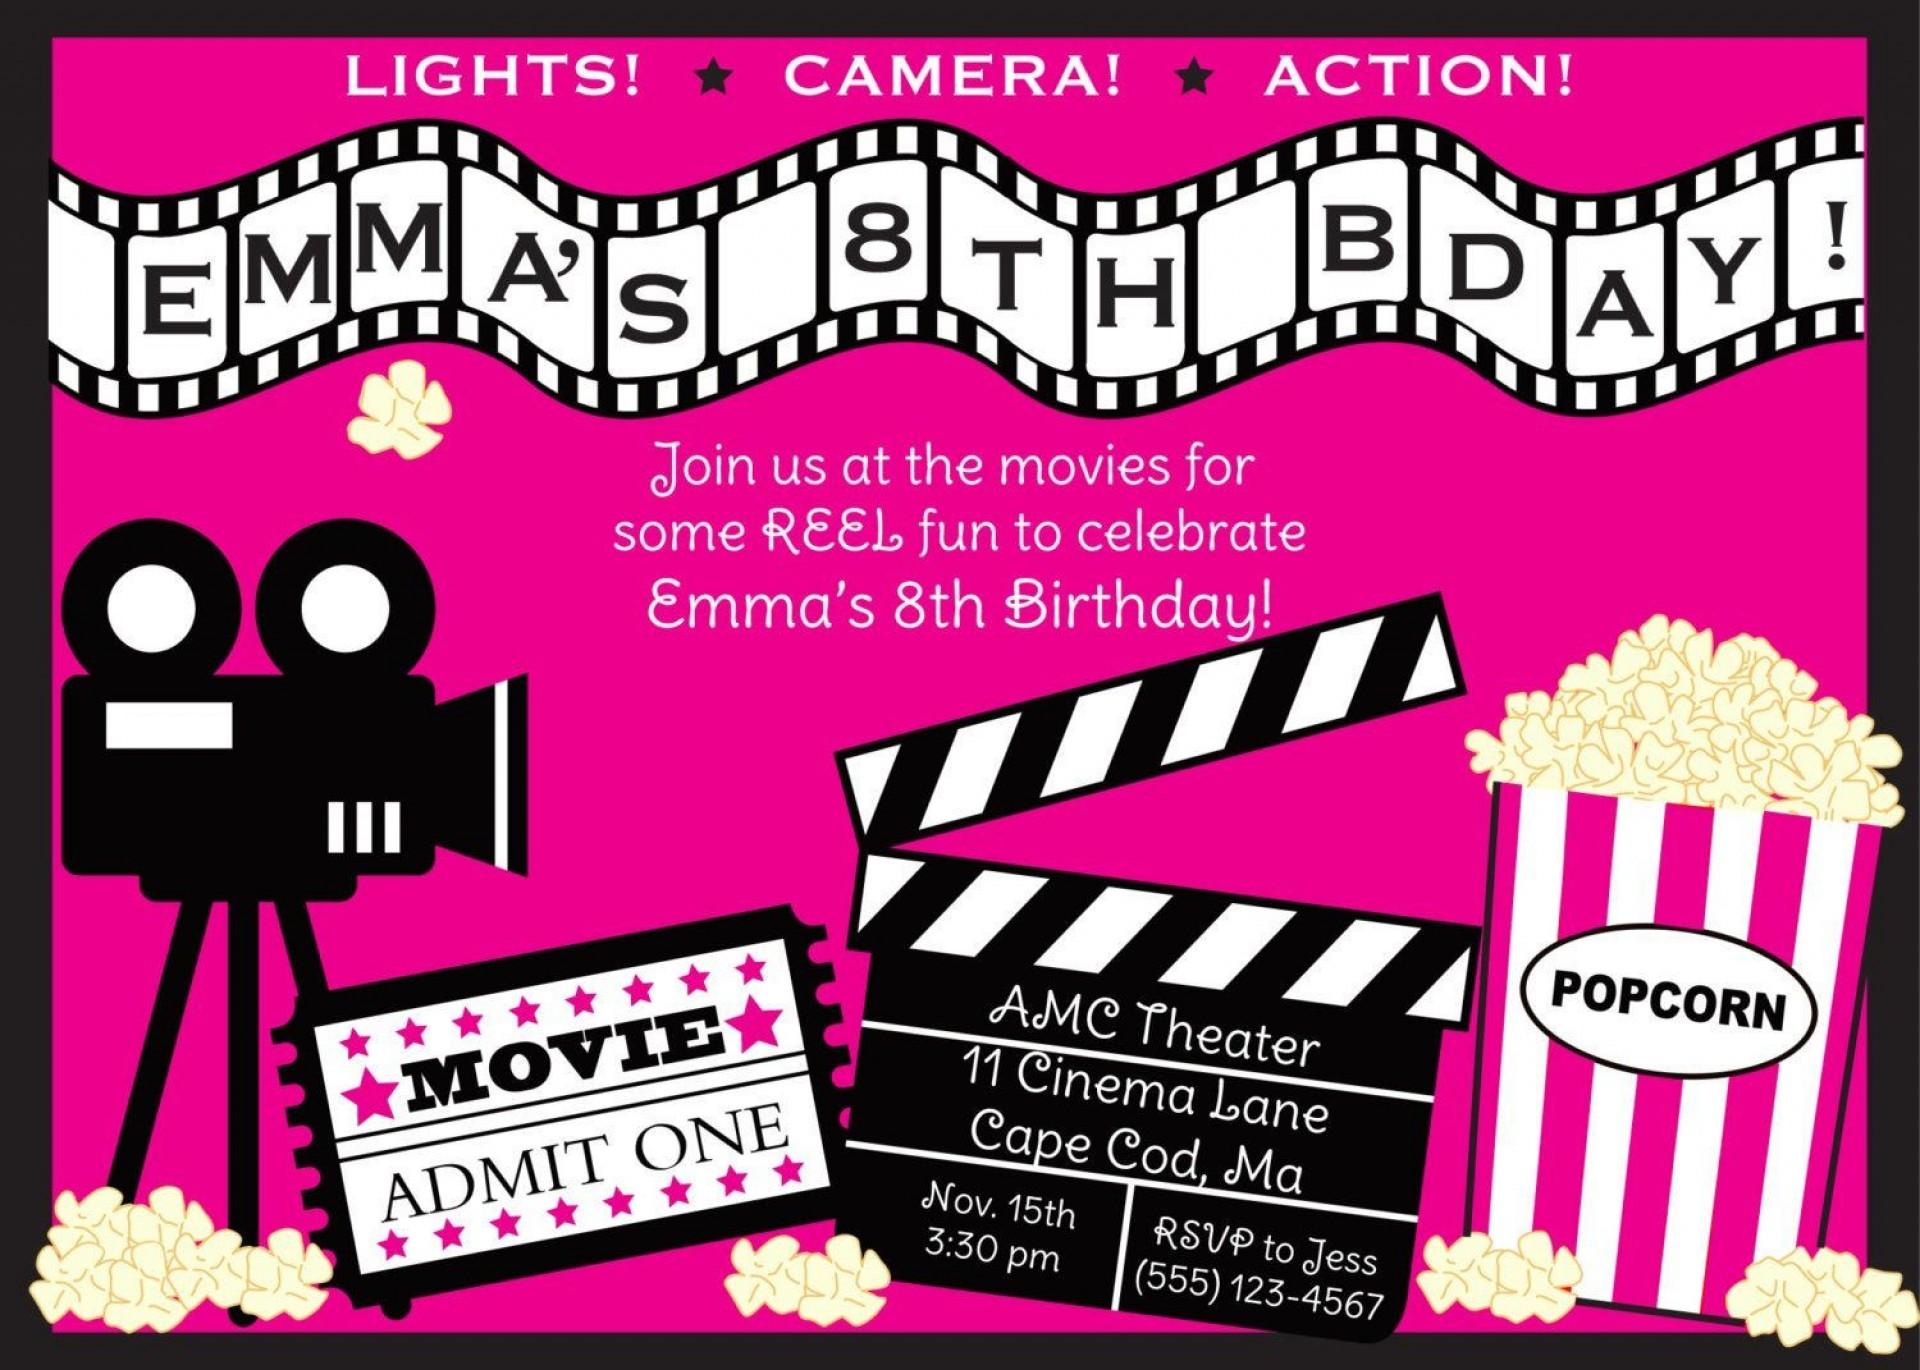 006 Rare Movie Ticket Invitation Template Photo  Blank Free Download Editable Printable1920